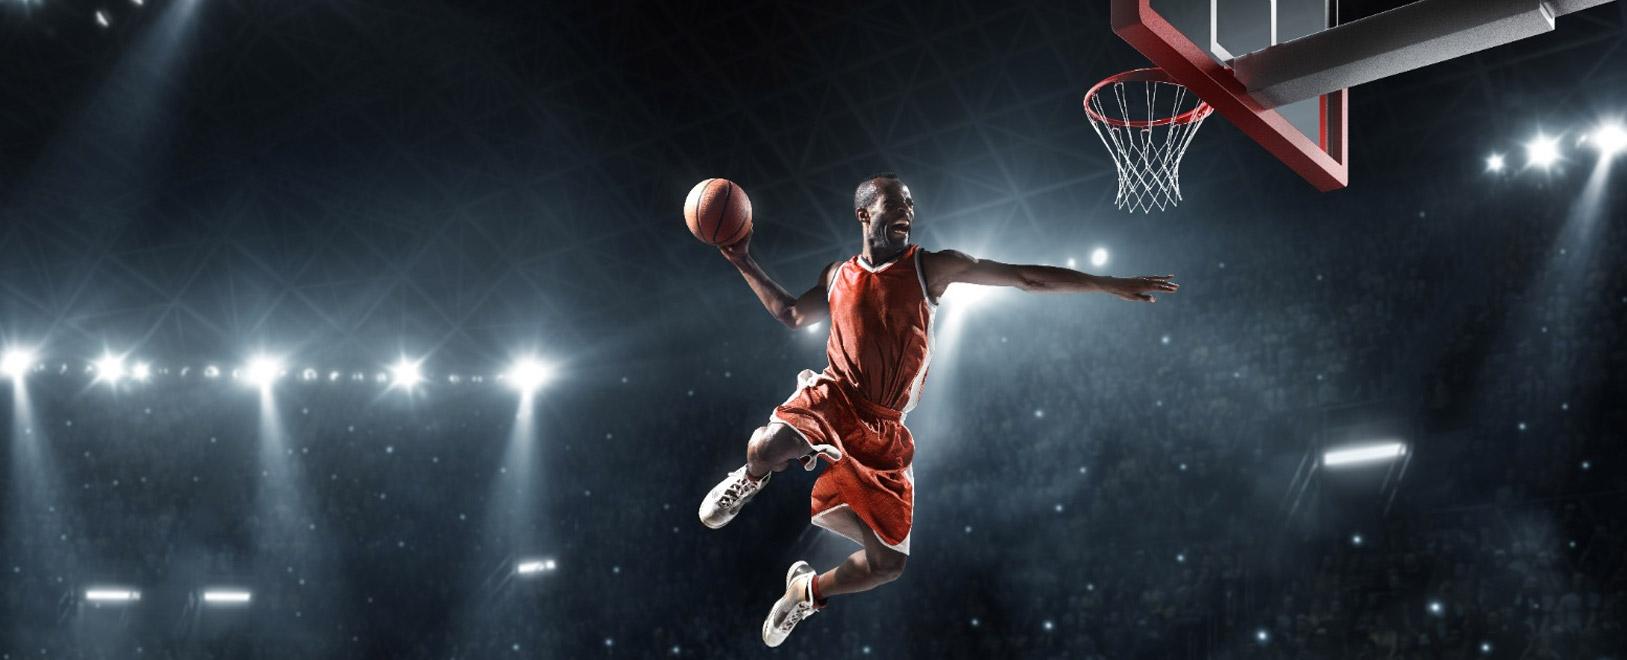 Play virtual basketball and enjoy online basketball betting!